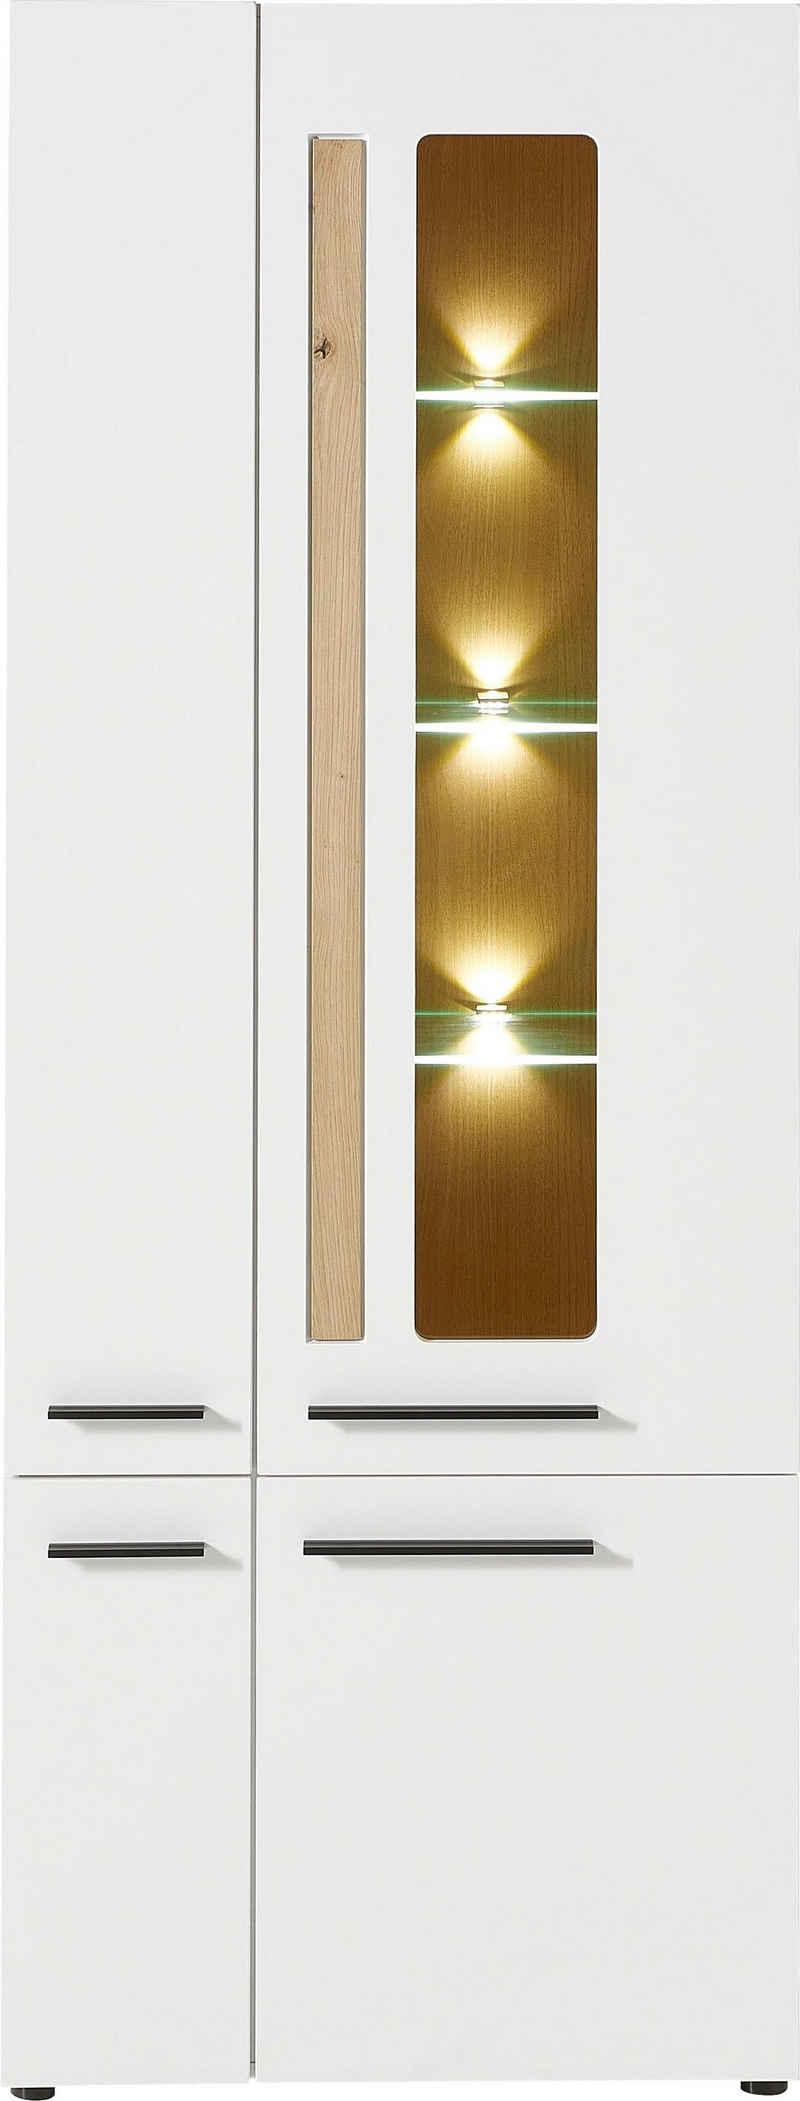 Innostyle Standvitrine »Loft Two« mit Soft-Close-Funktion, inkl. Beleuchtung